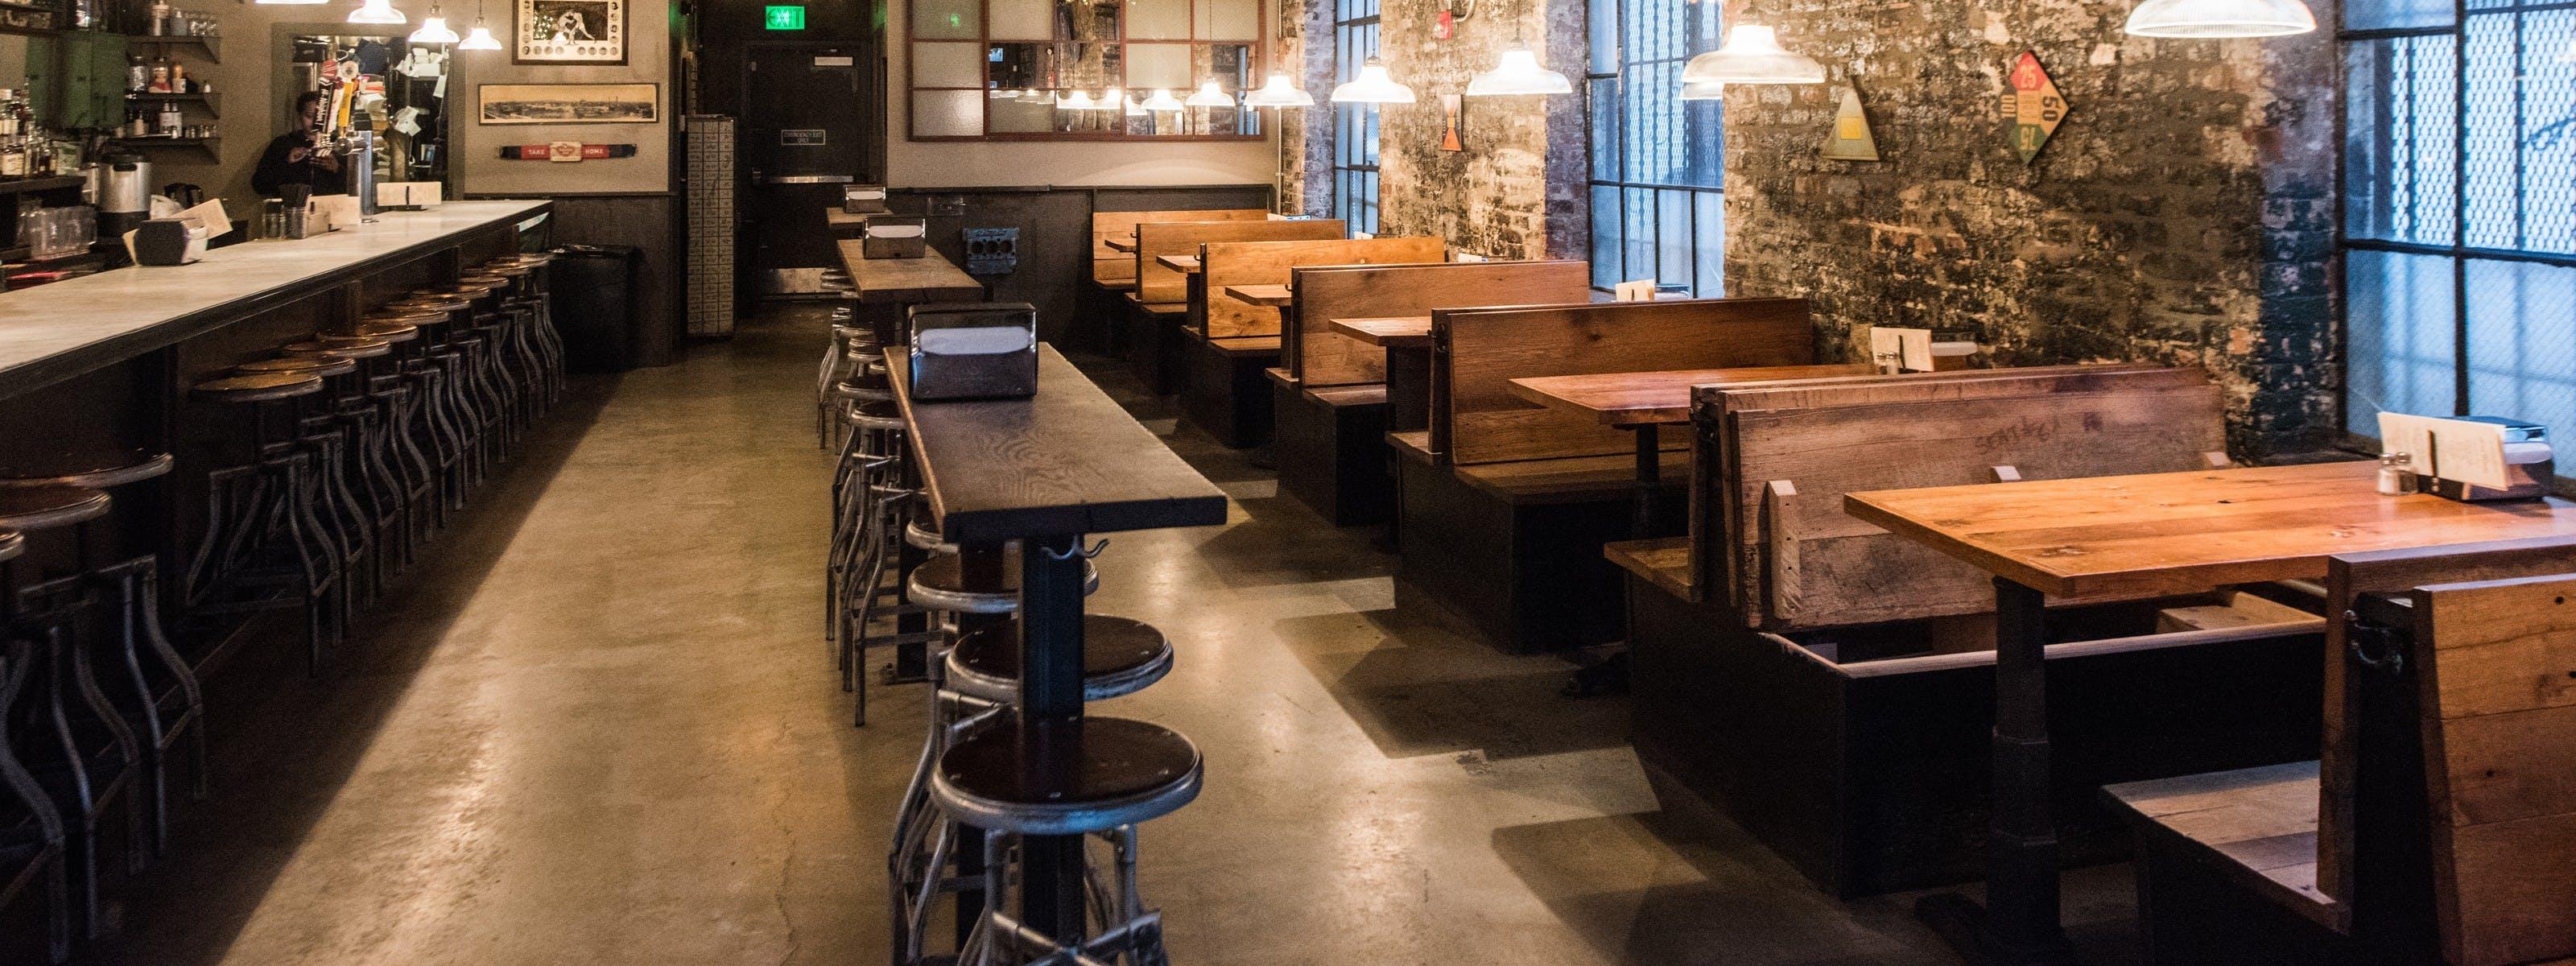 The Best Bars On The 14th Street / U Street Corridor - Washington DC - The Infatuation